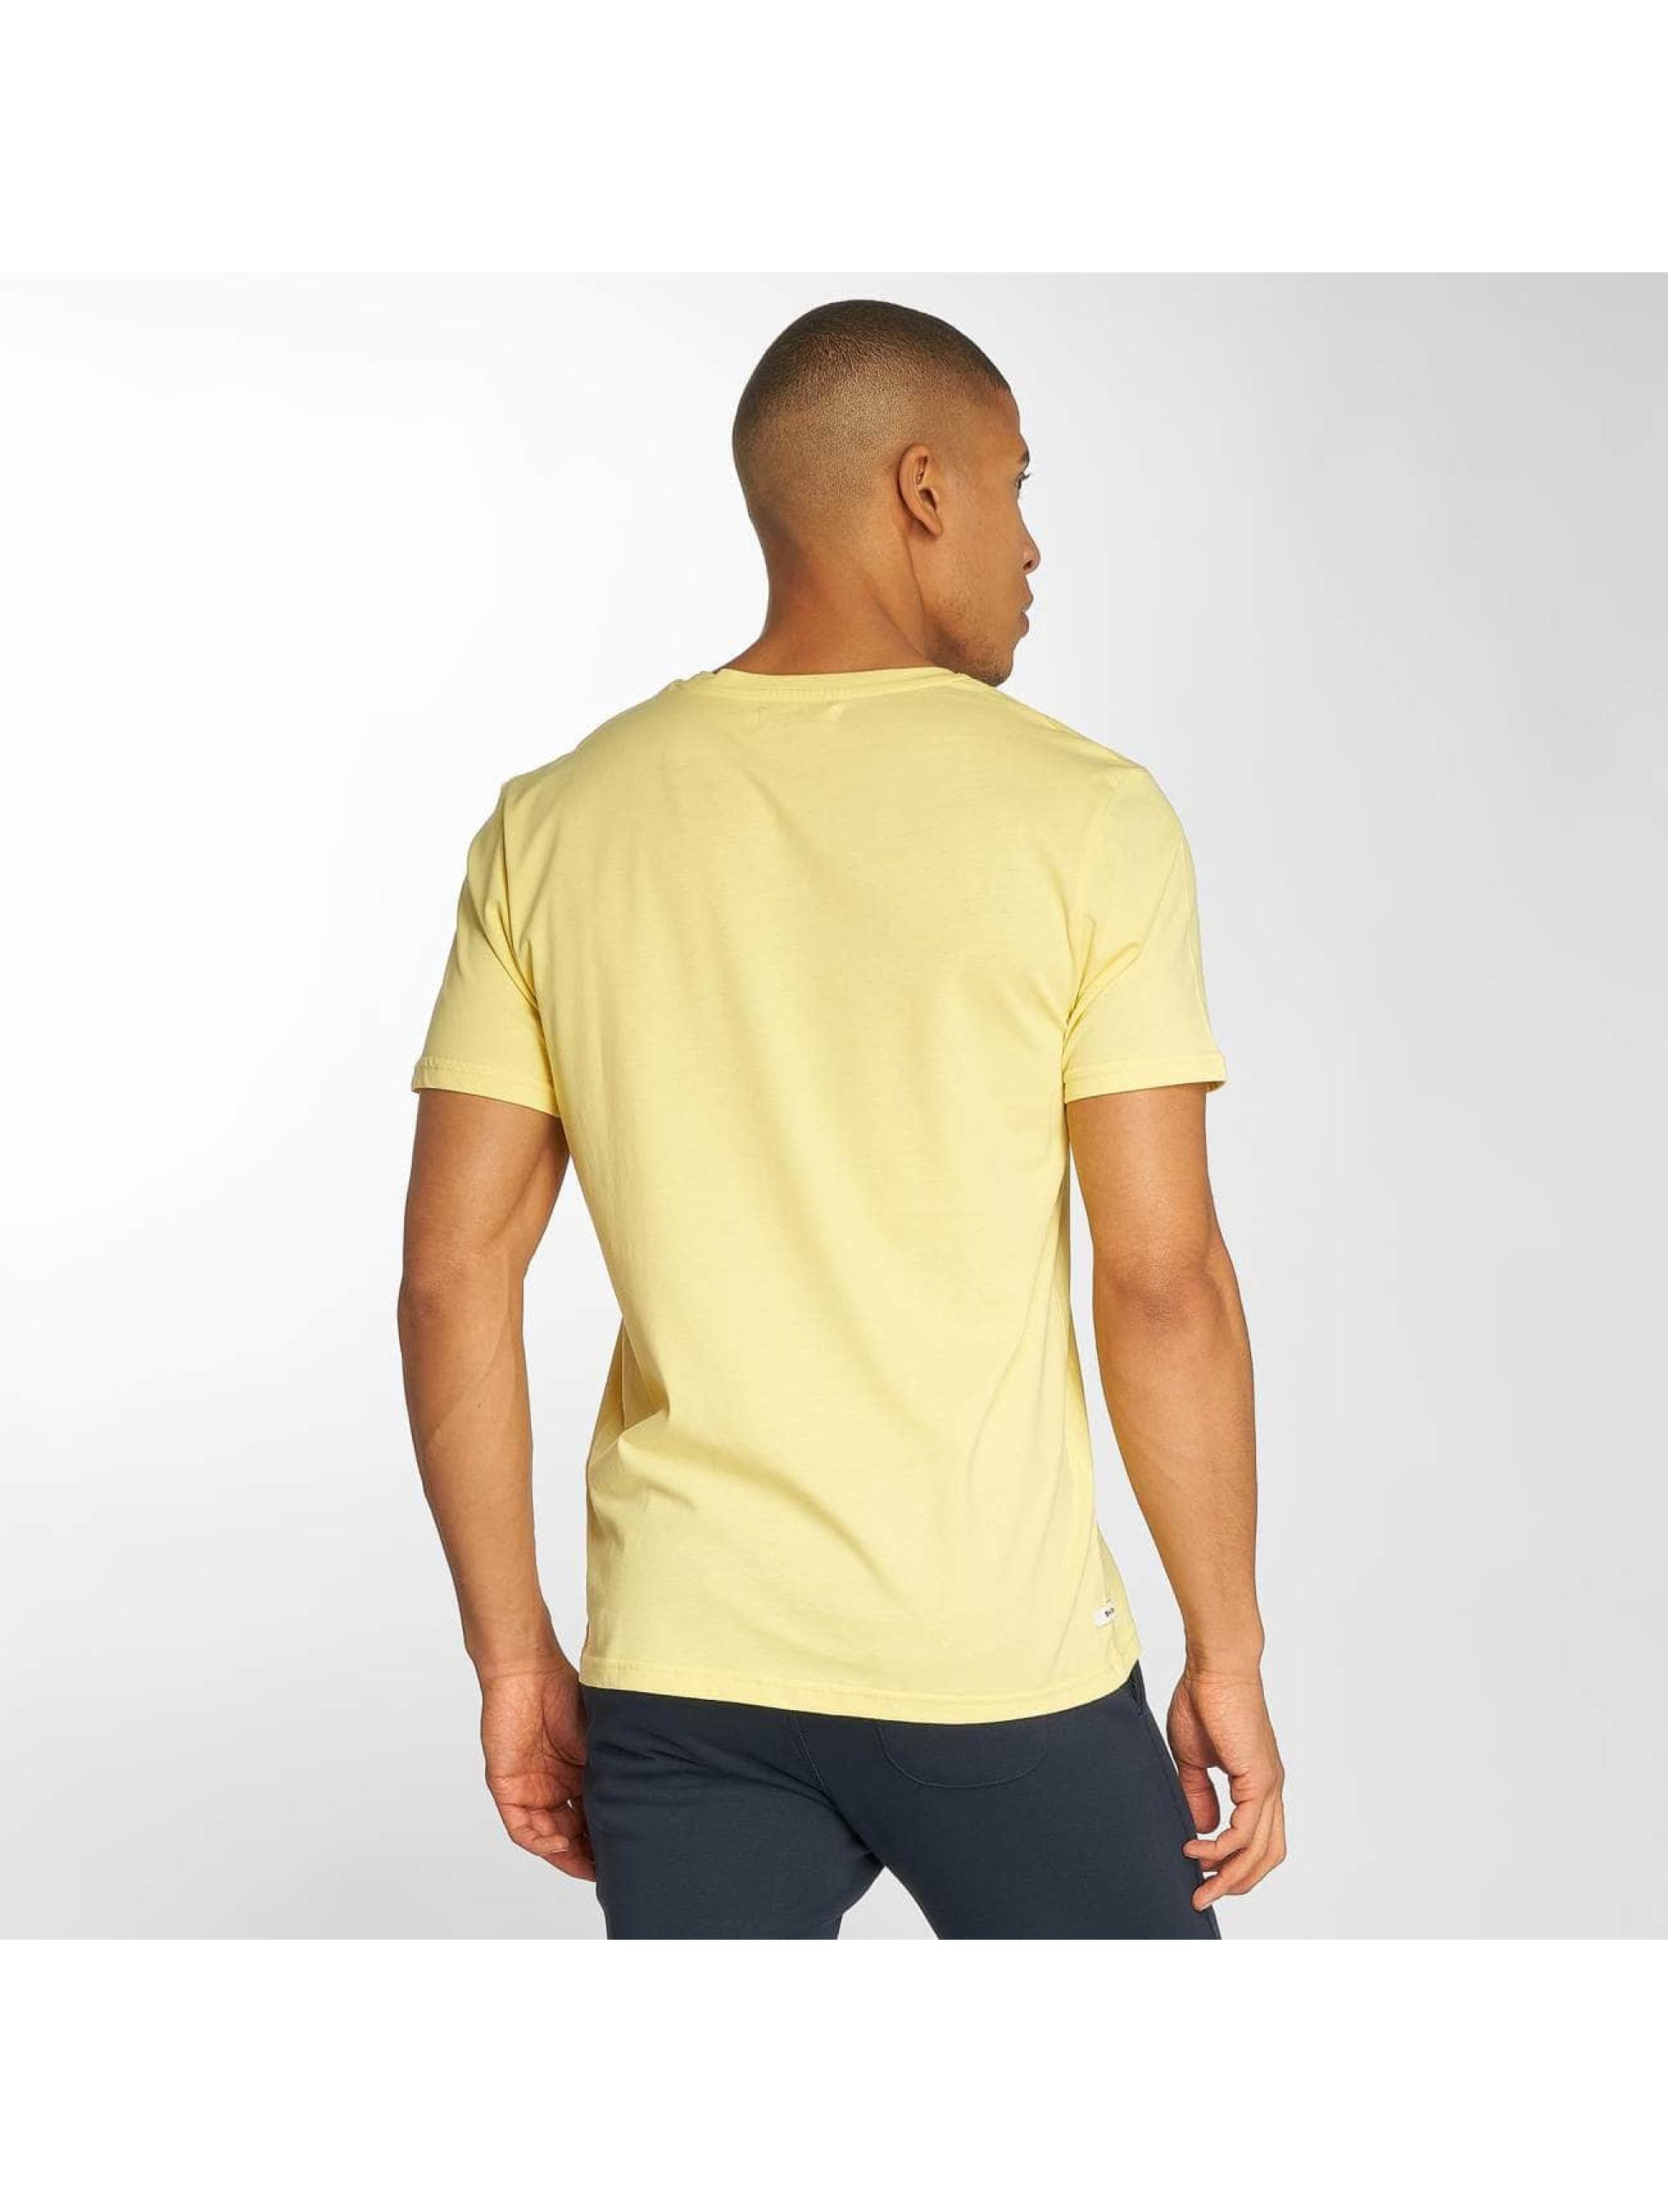 Kulte t-shirt Motor geel